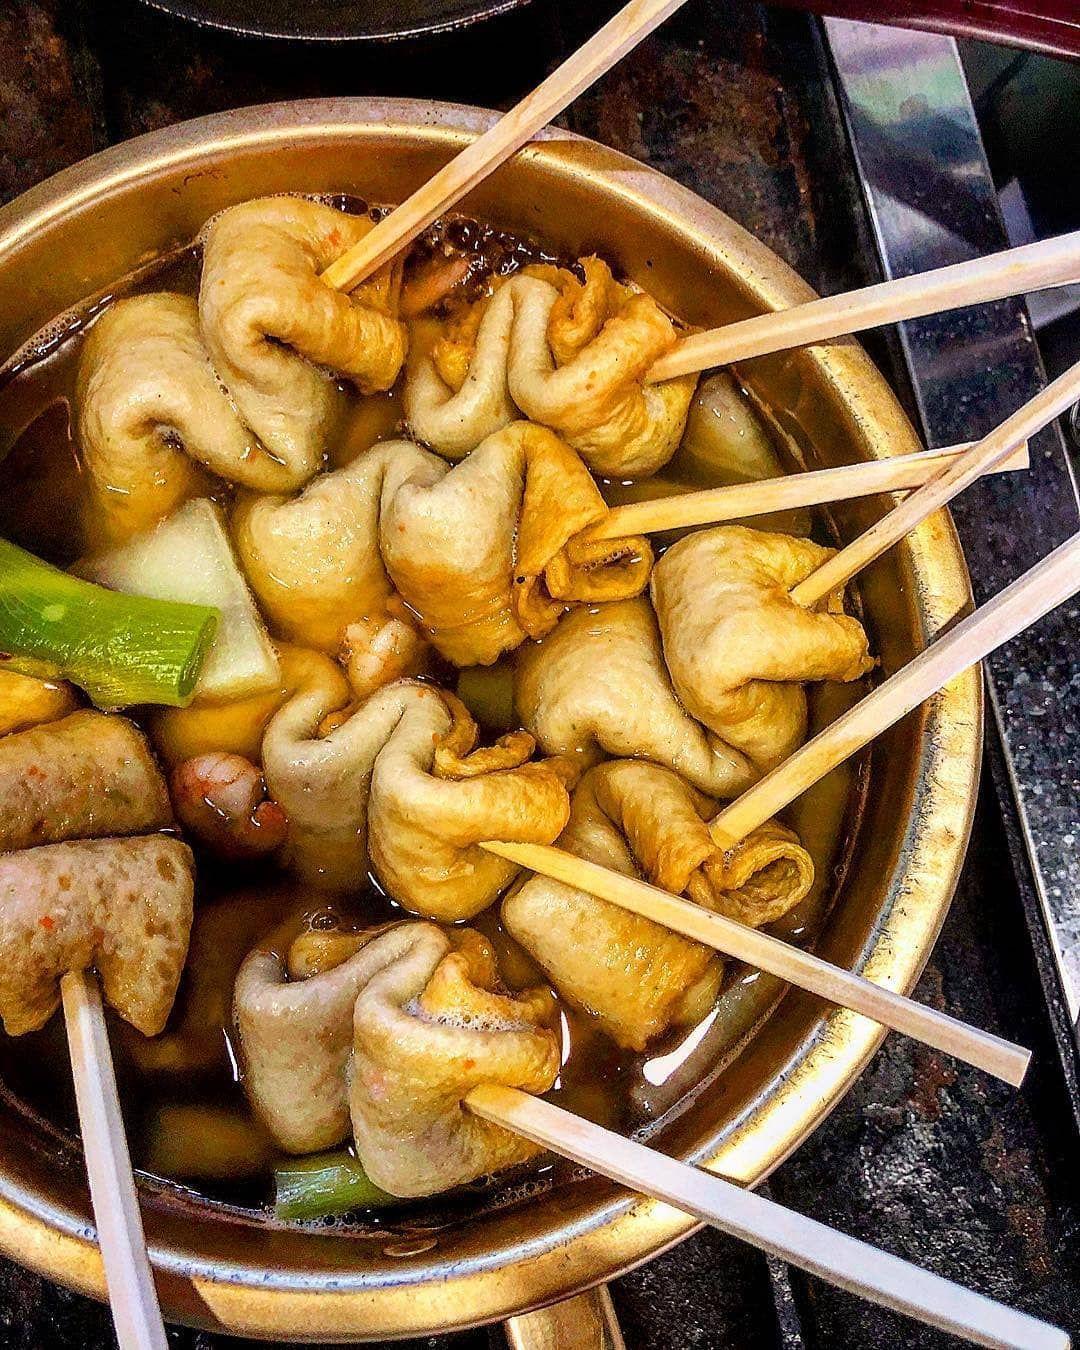 Makanan Korea Korean Food On Instagram Oden Baso Ikan Khas Korea Khas Busan Asli Ga Cuma Mirip Oden Only Makanan Dan Minuman Makanan Korea Makanan